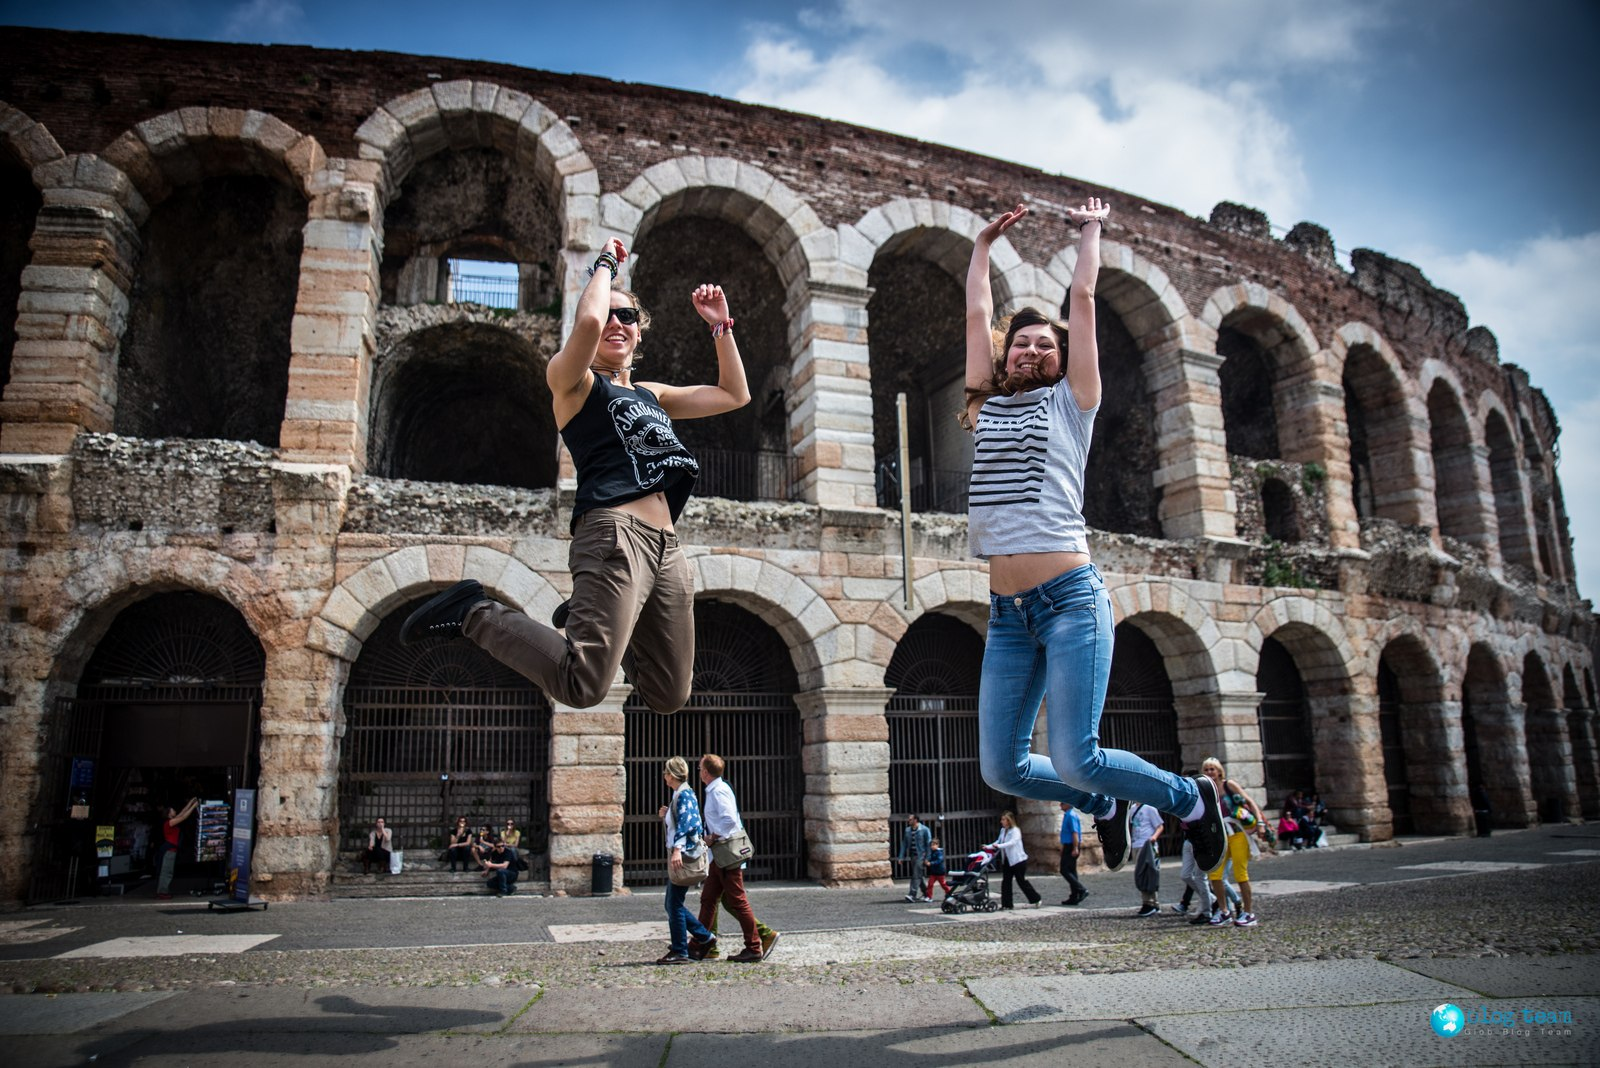 Amfiteatr, Werona - Arena di Verona